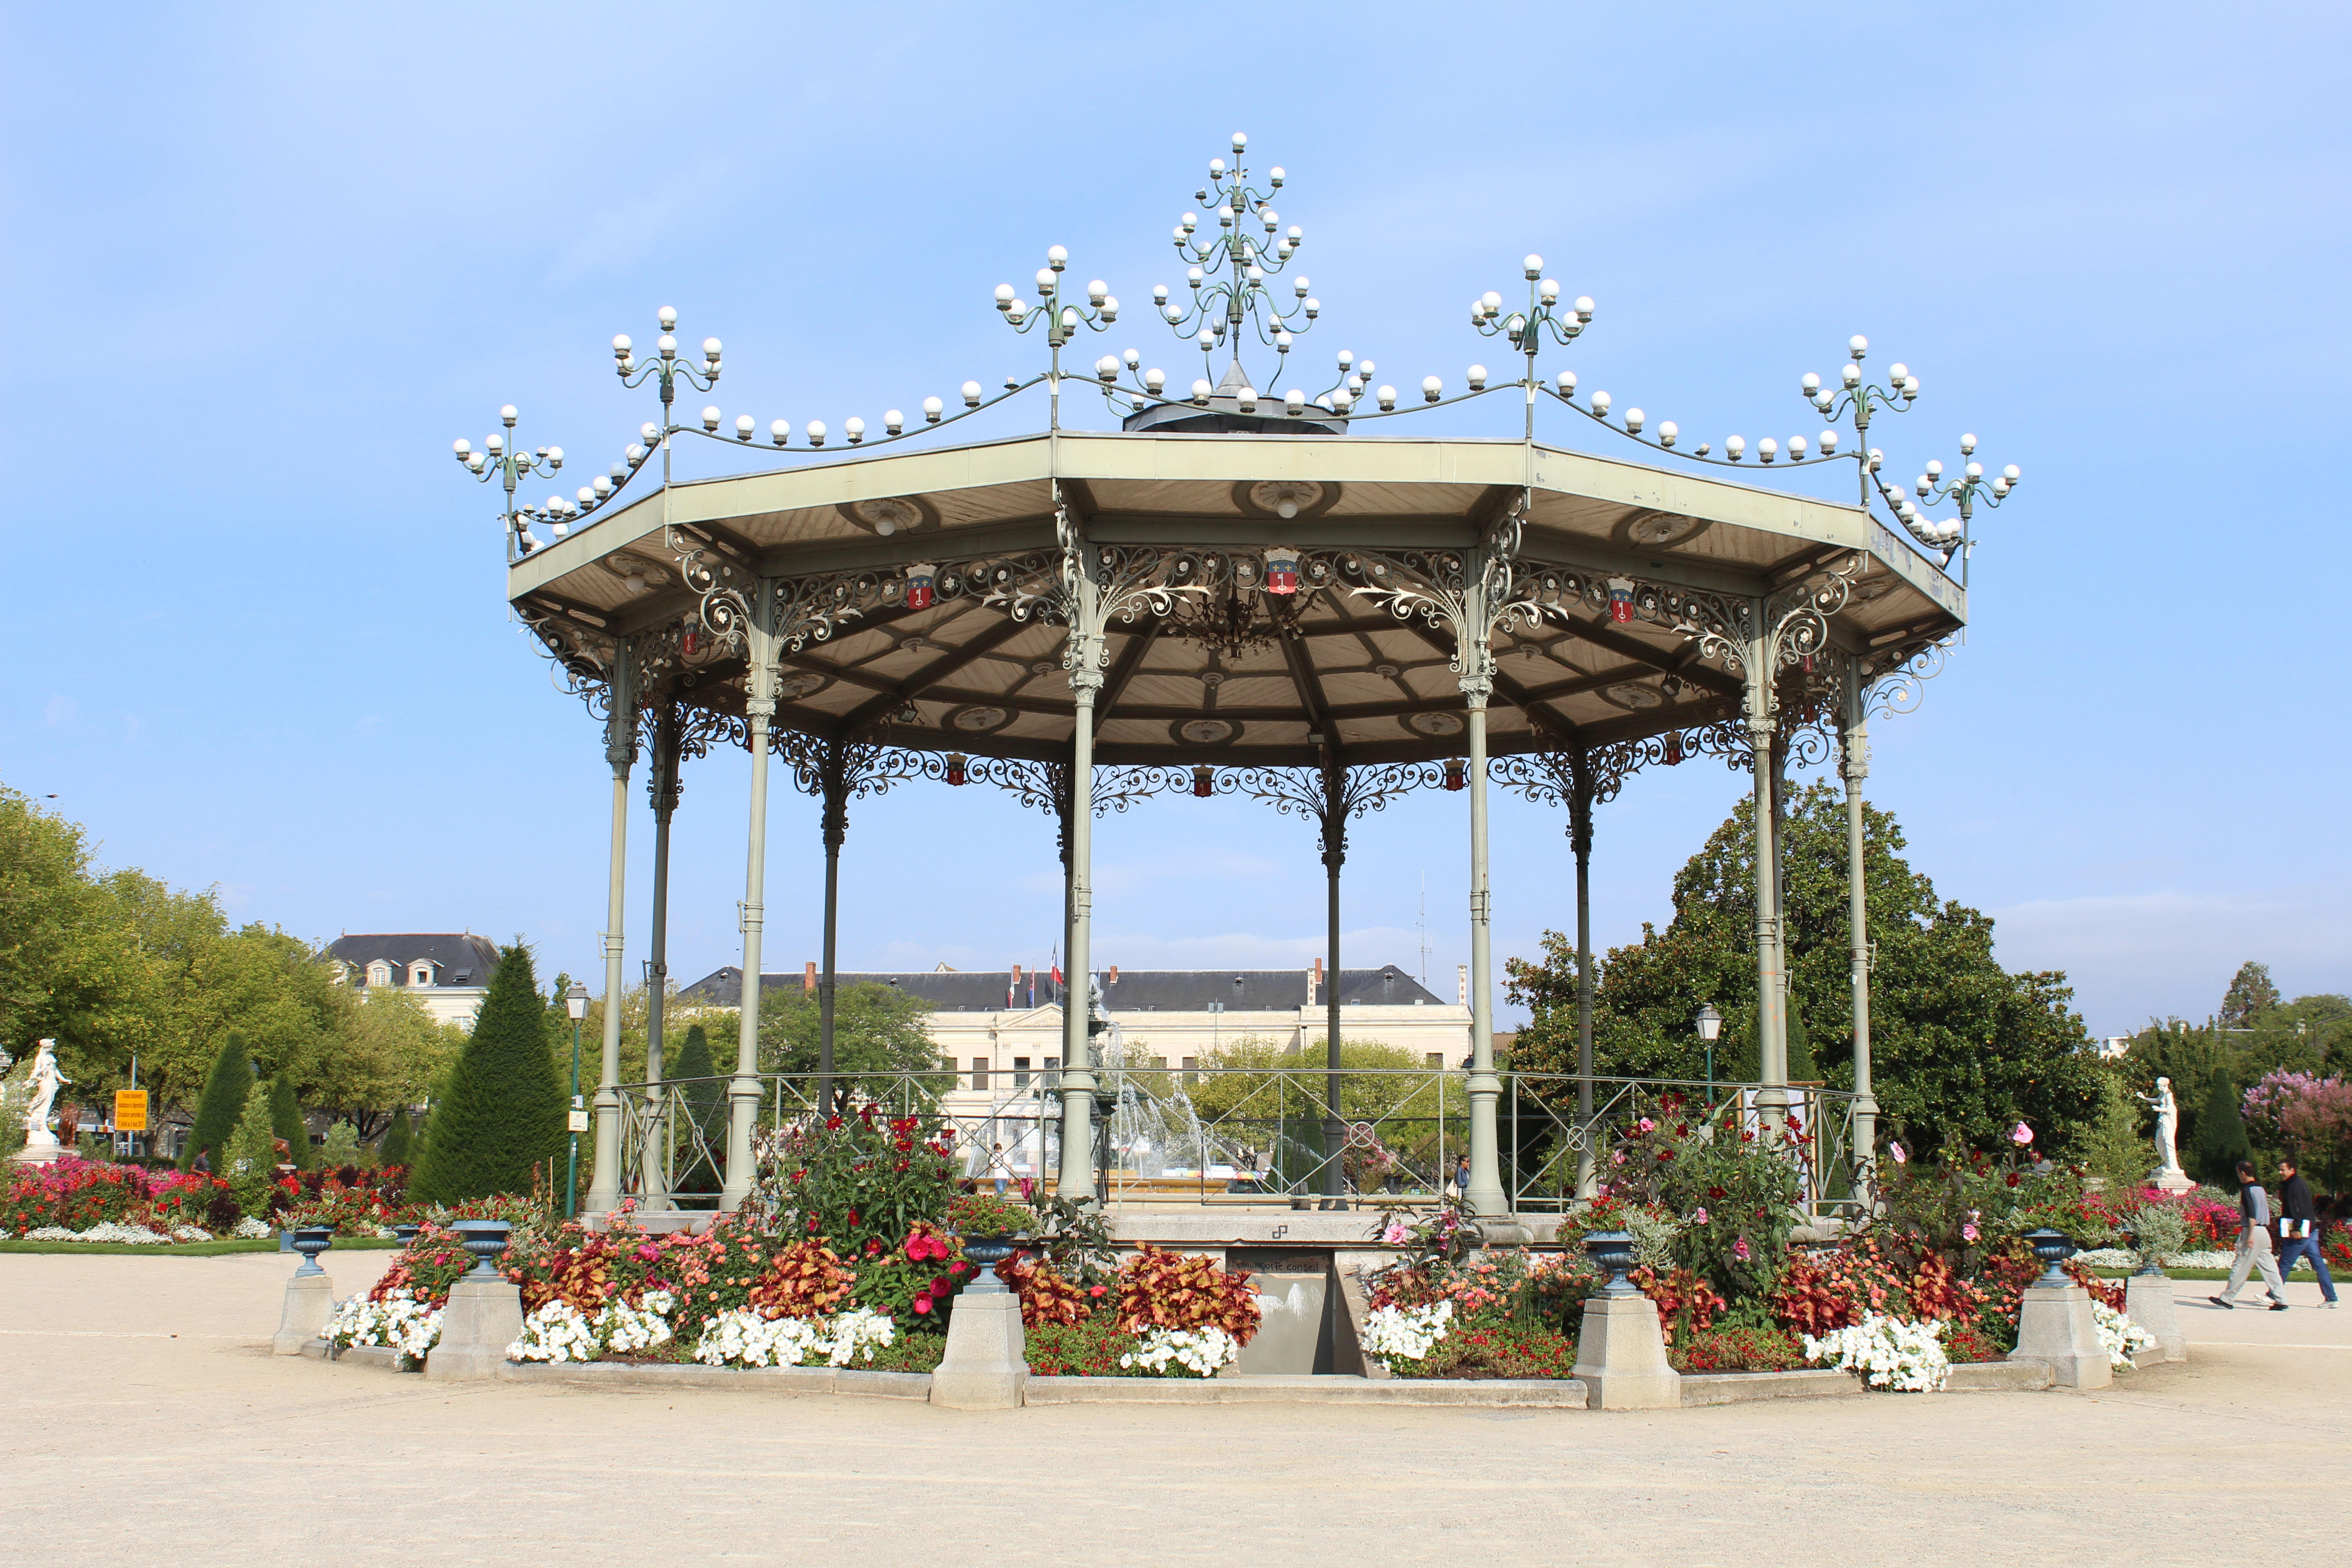 File:Kiosque Jardin Mail Angers 5.jpg - Wikimedia Commons